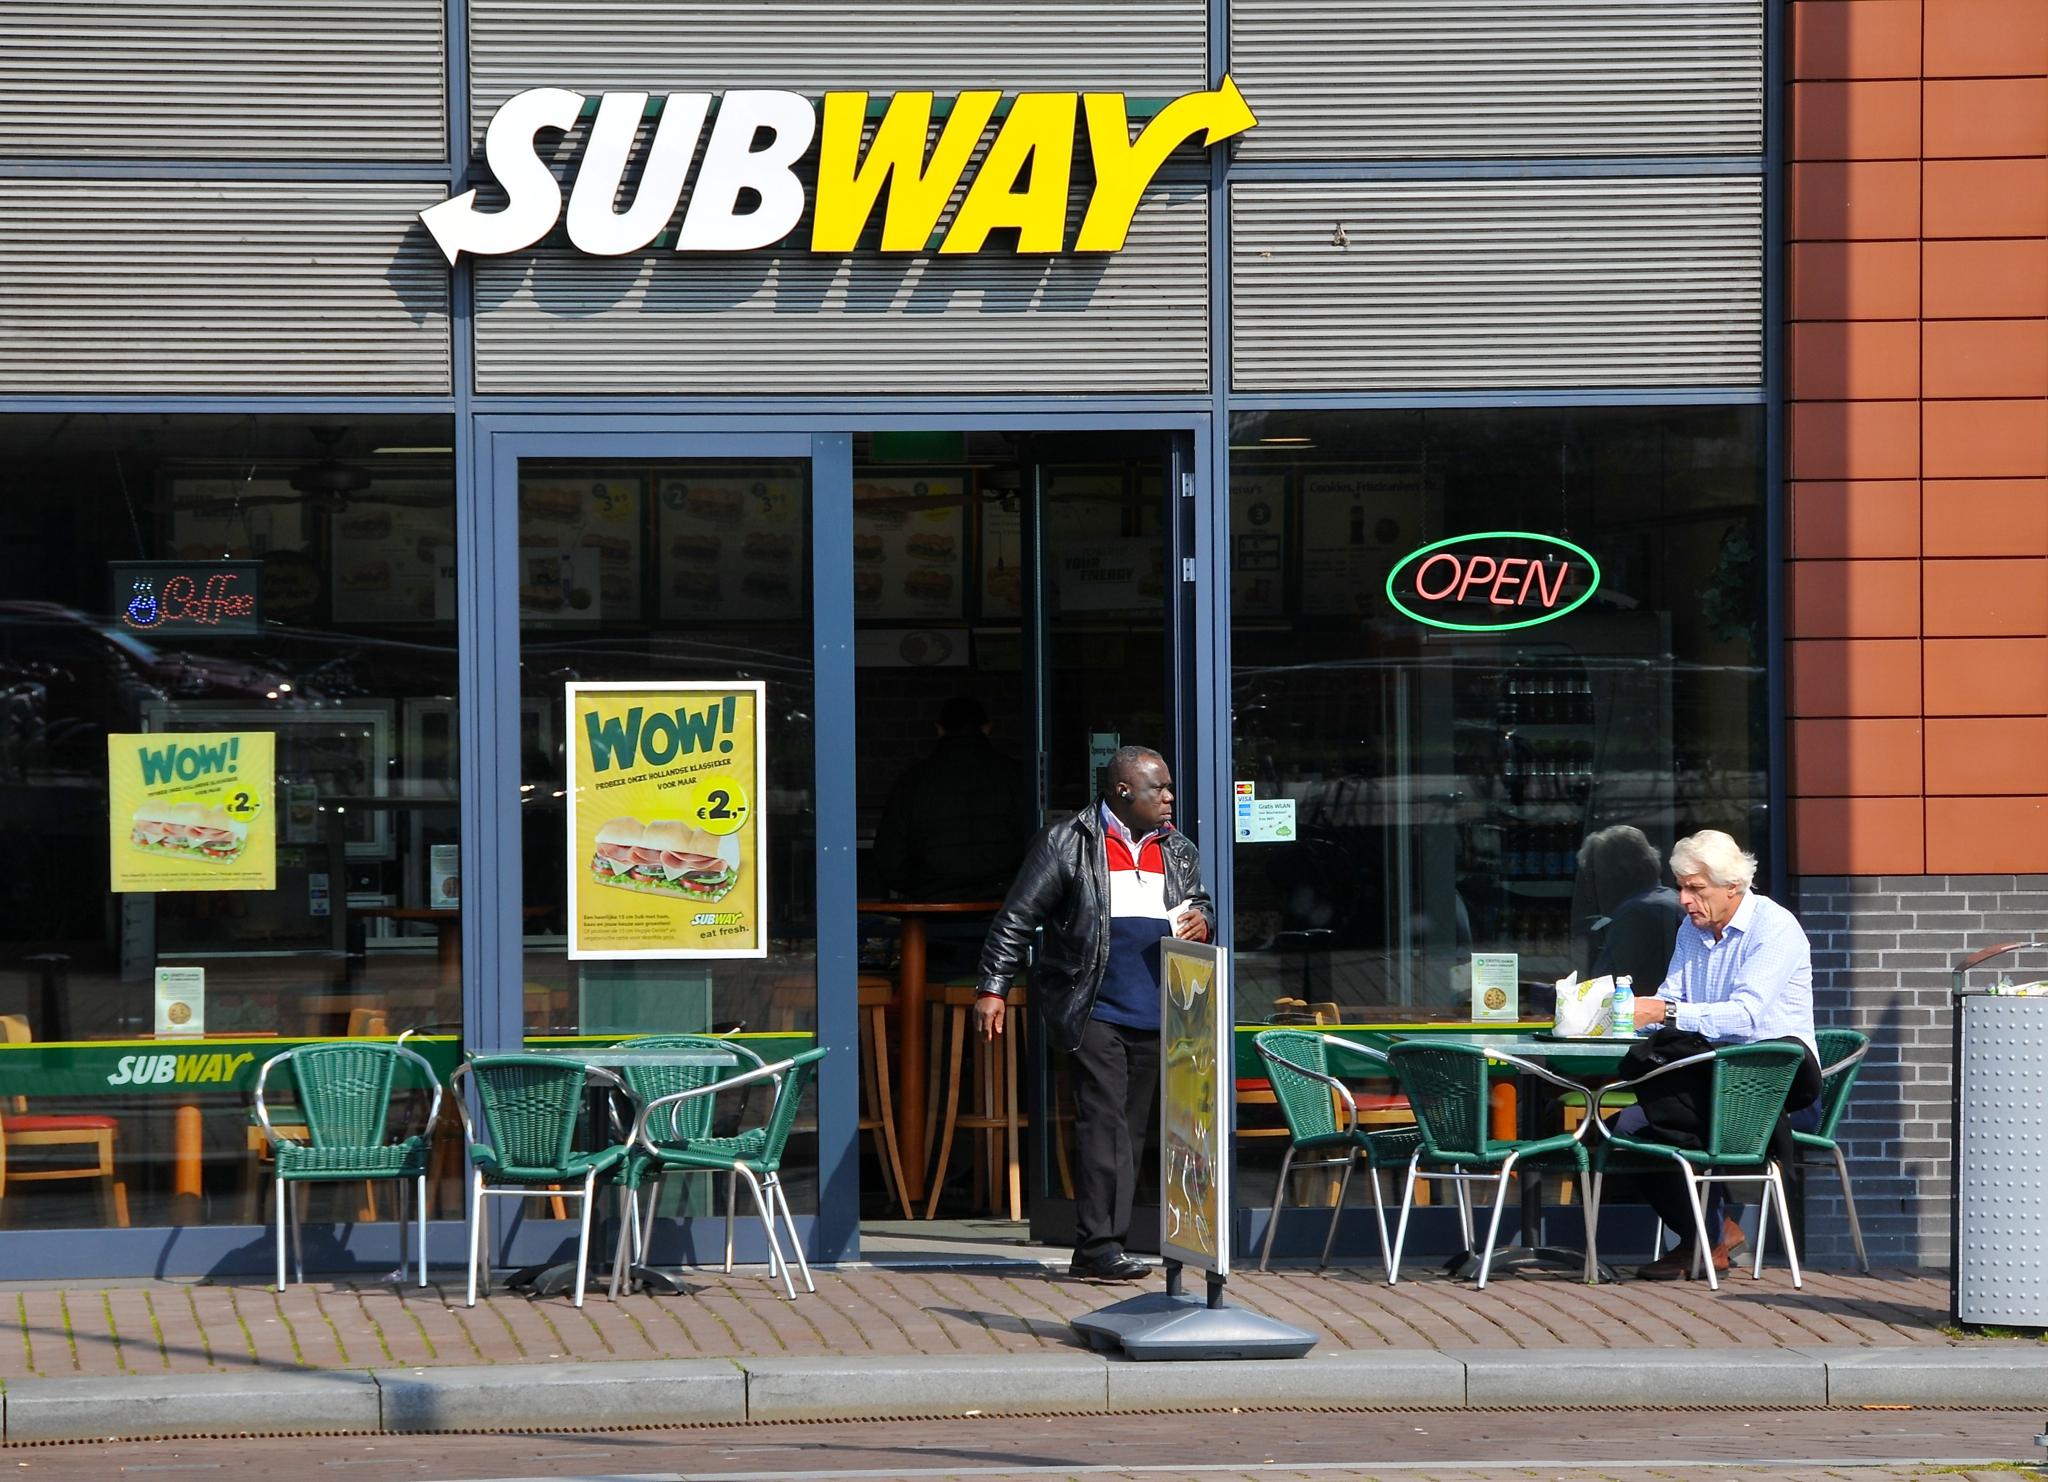 Copy of Subway